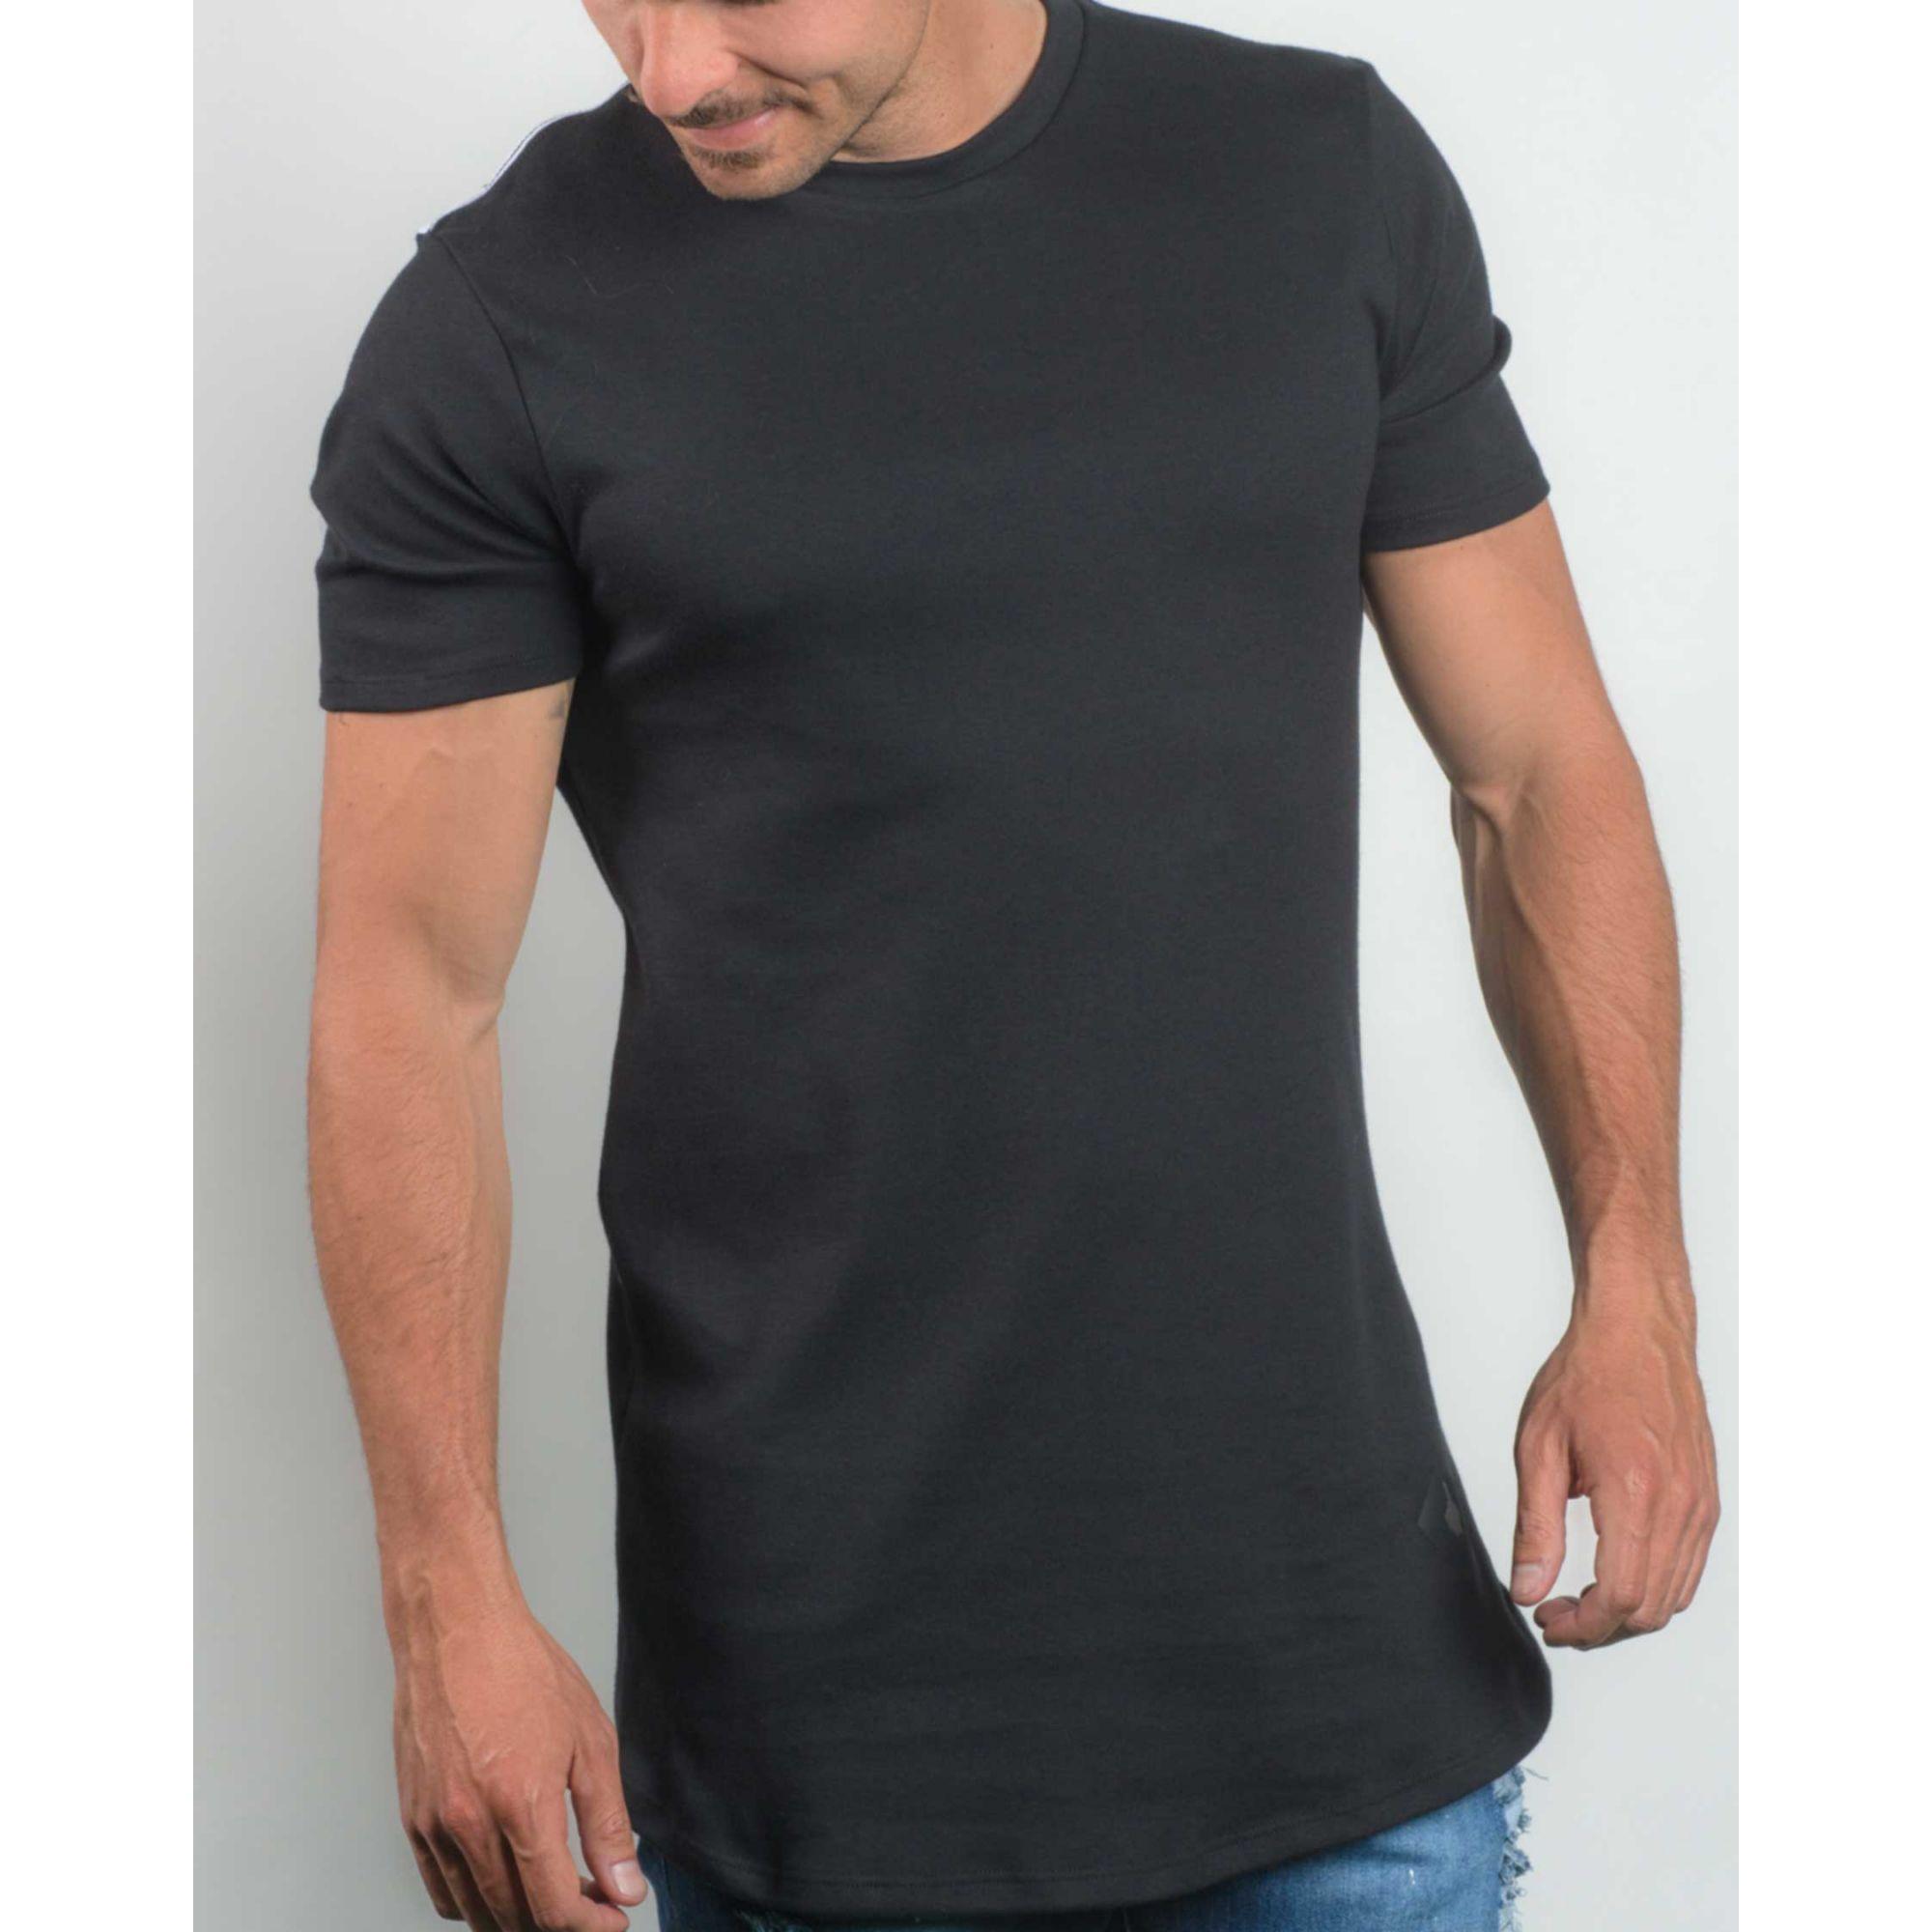 Camiseta Buh Back Mesh Black & White